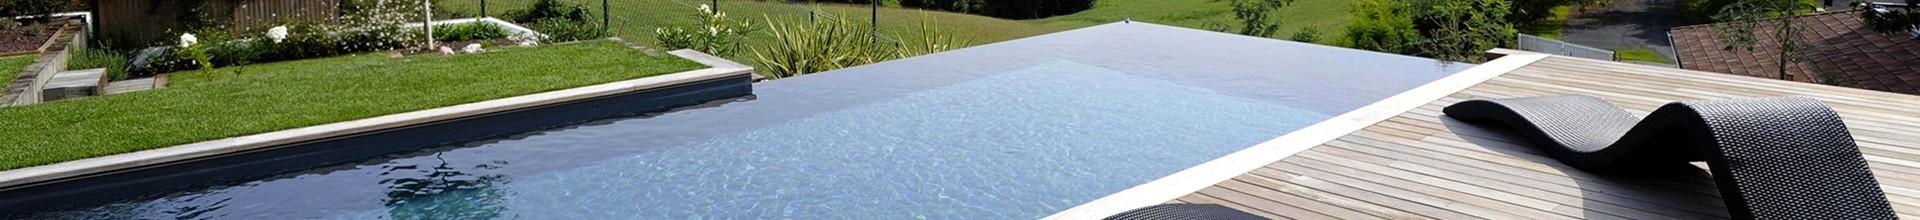 Luxembourg conception conteneur piscine coque sur mesure Luxembourg